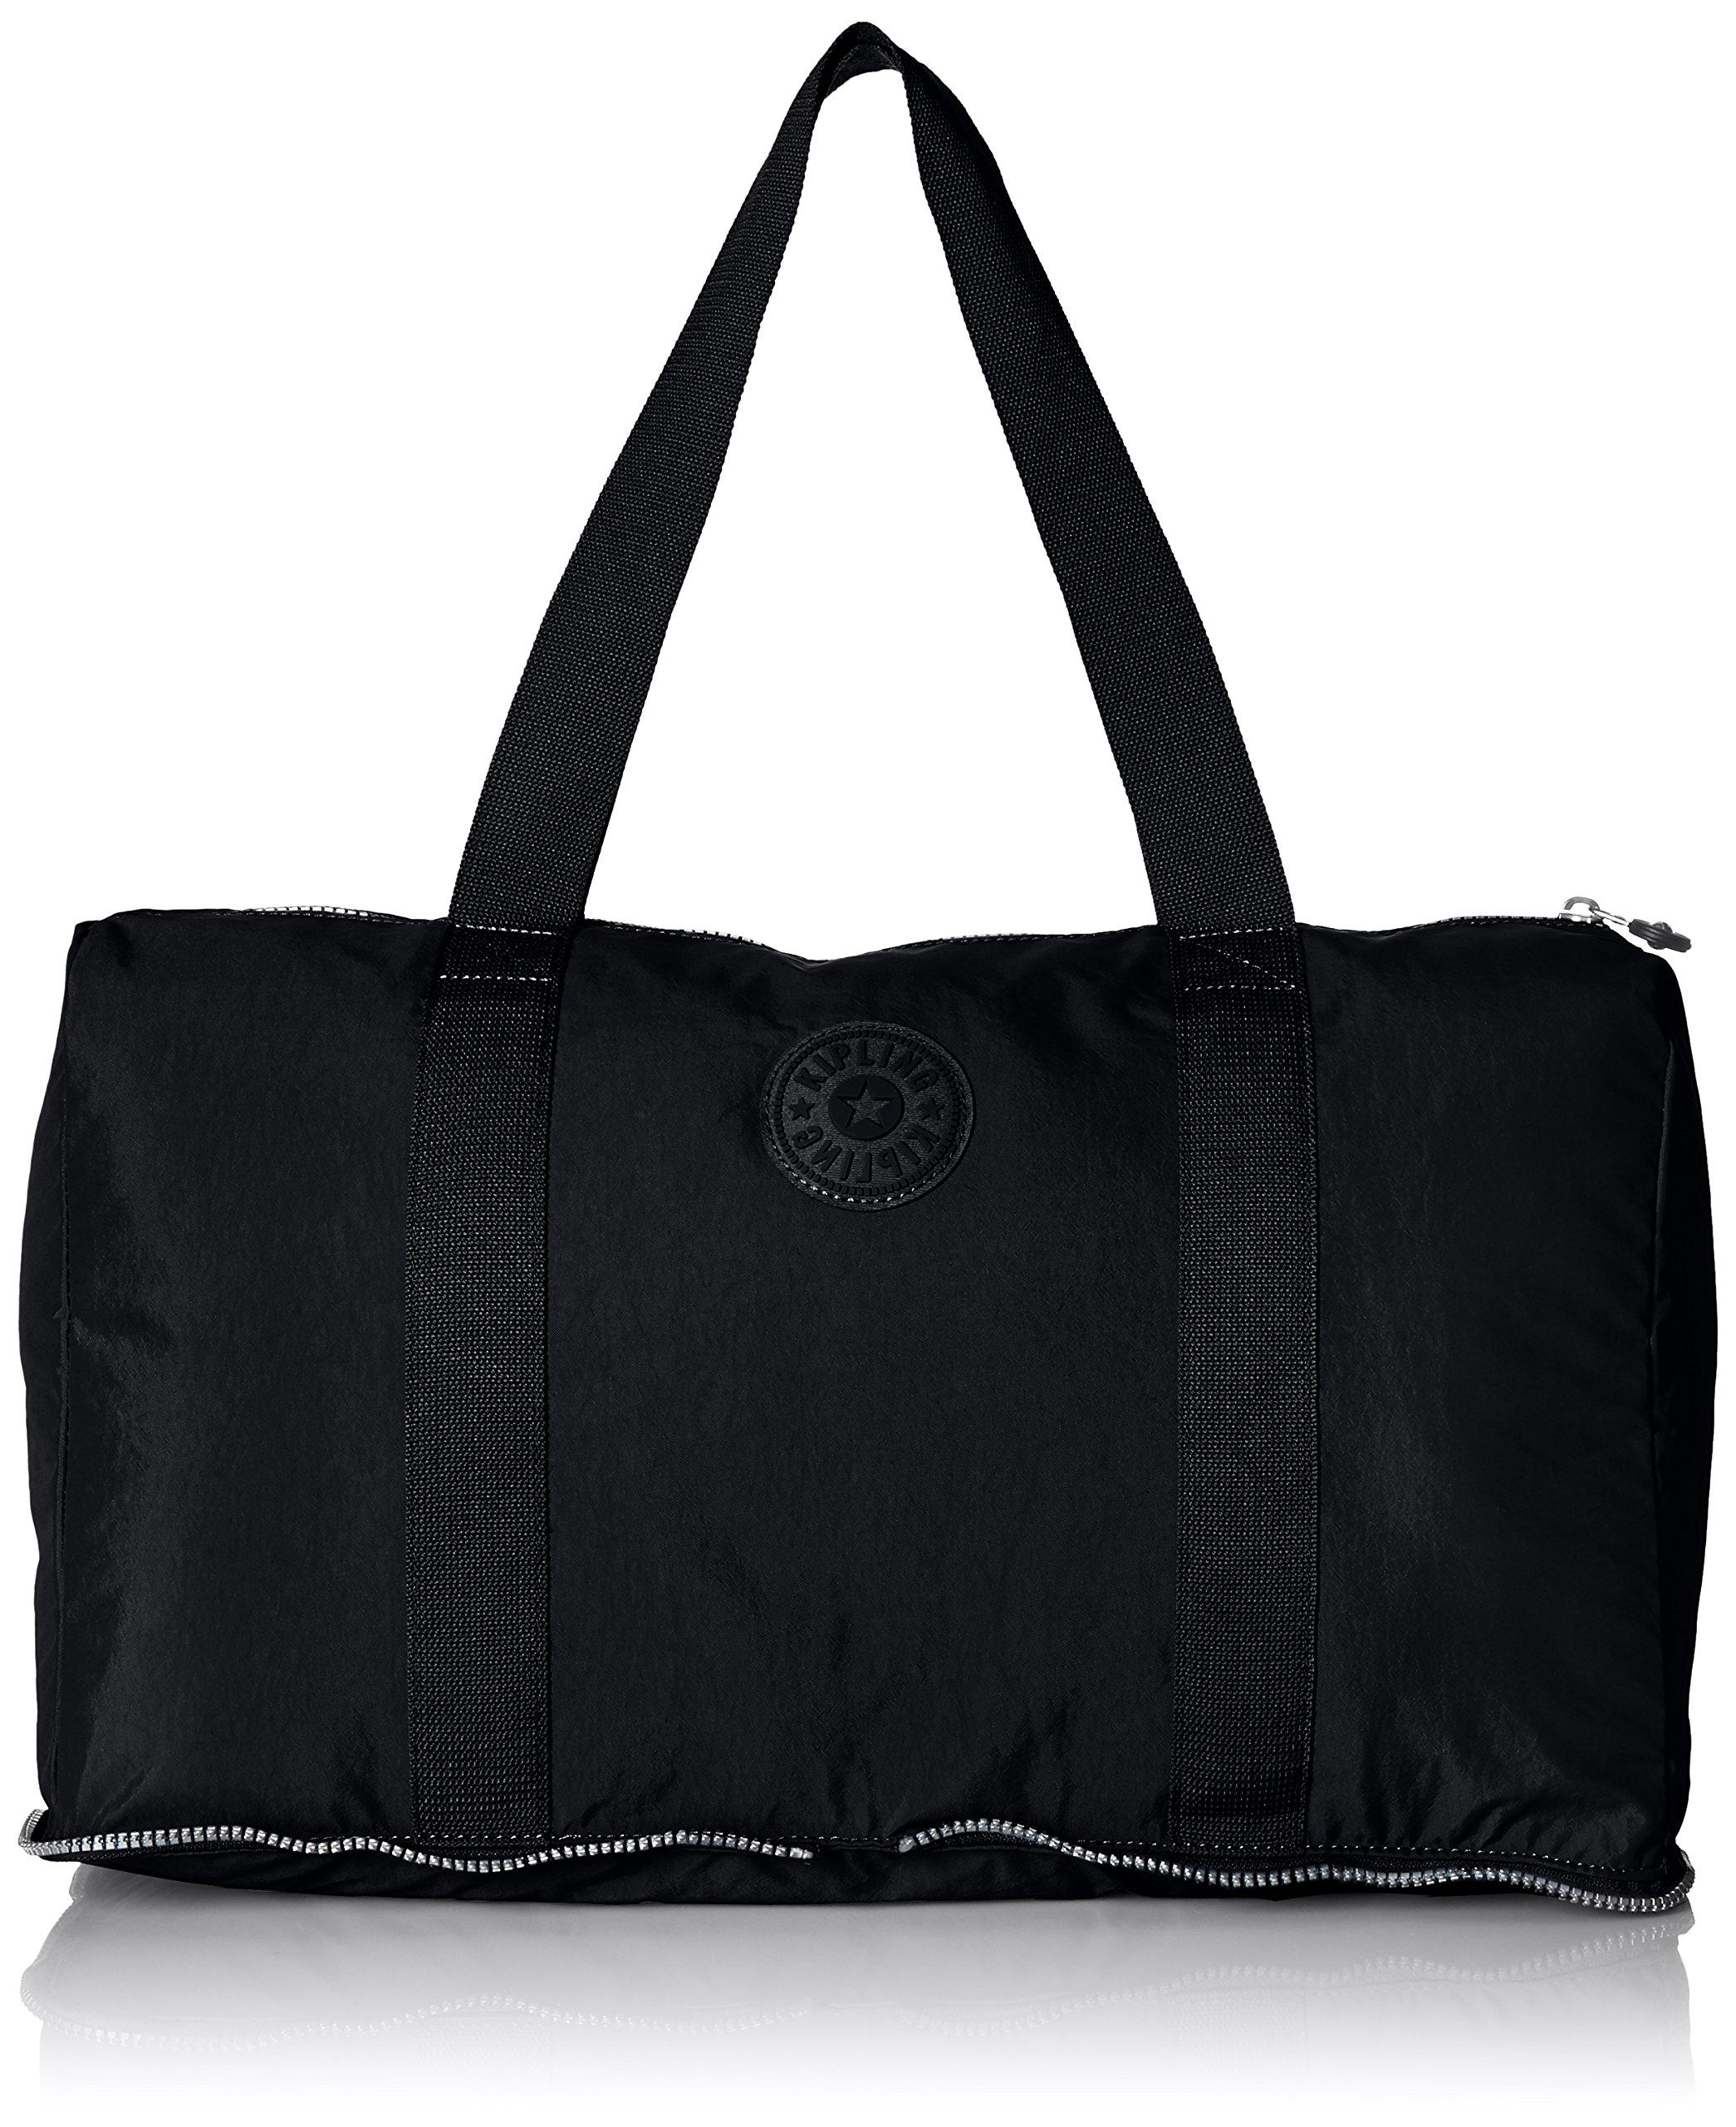 Kipling Women's Honest Solid Packable Duffle Bag, Black